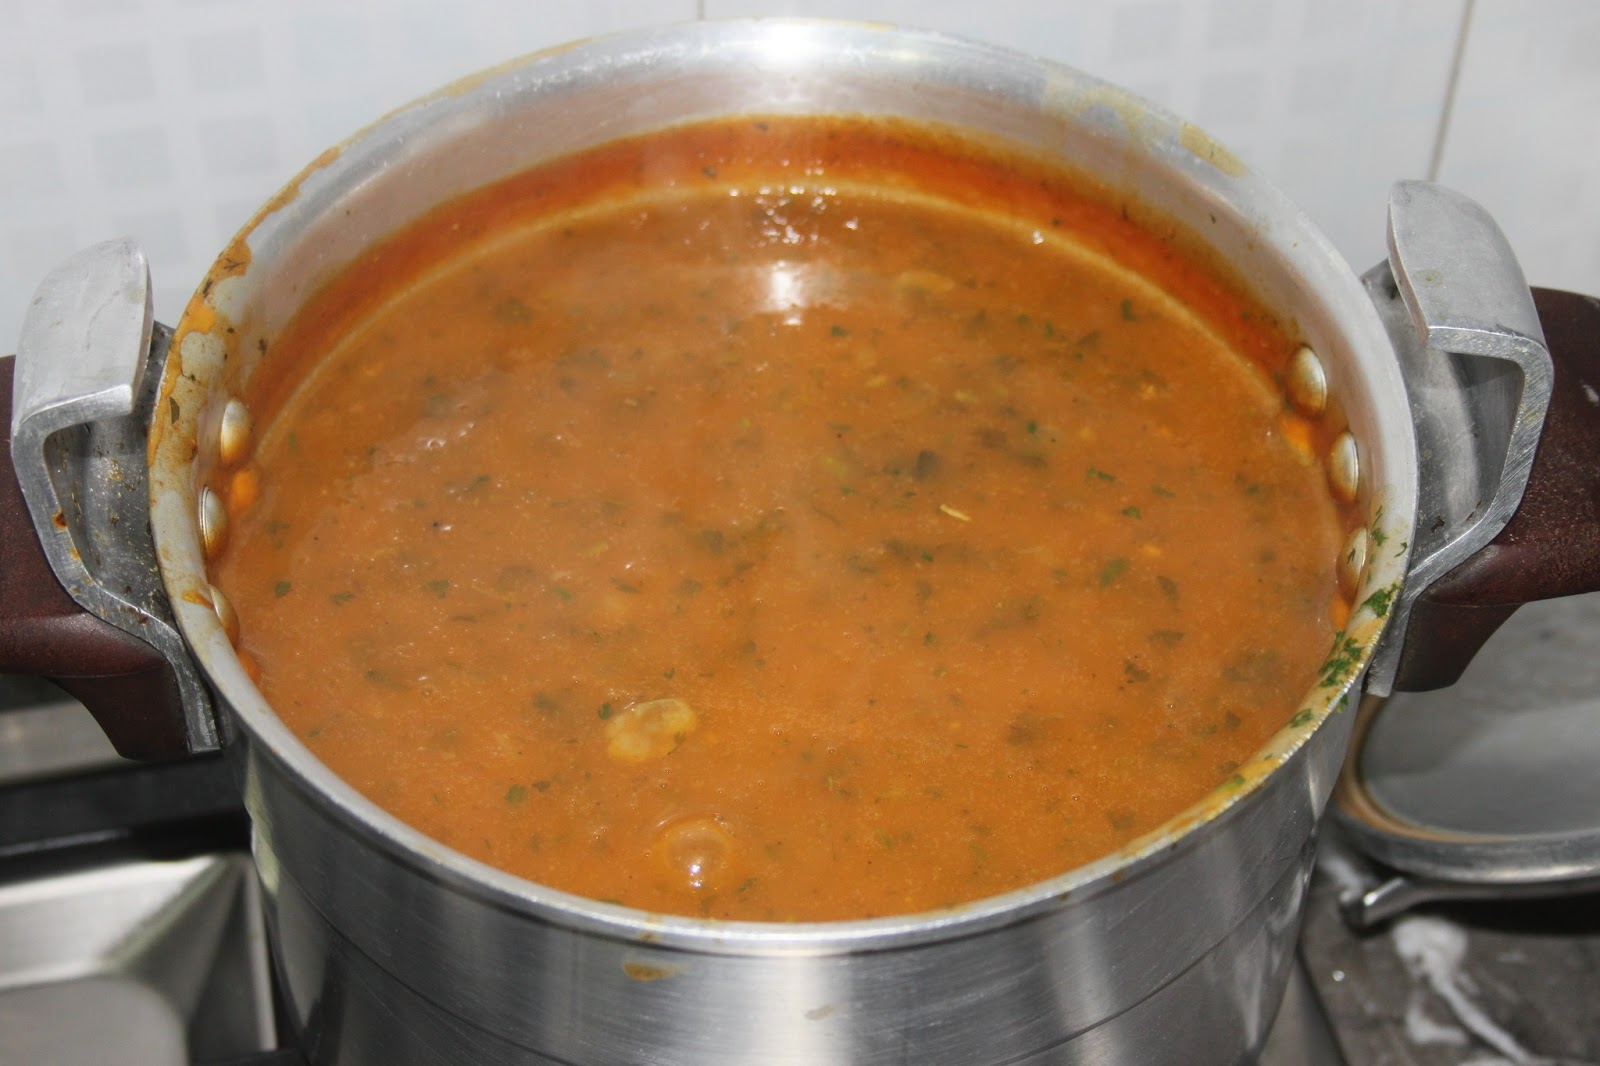 La cuisine de bernard harira for Cuisine bernard